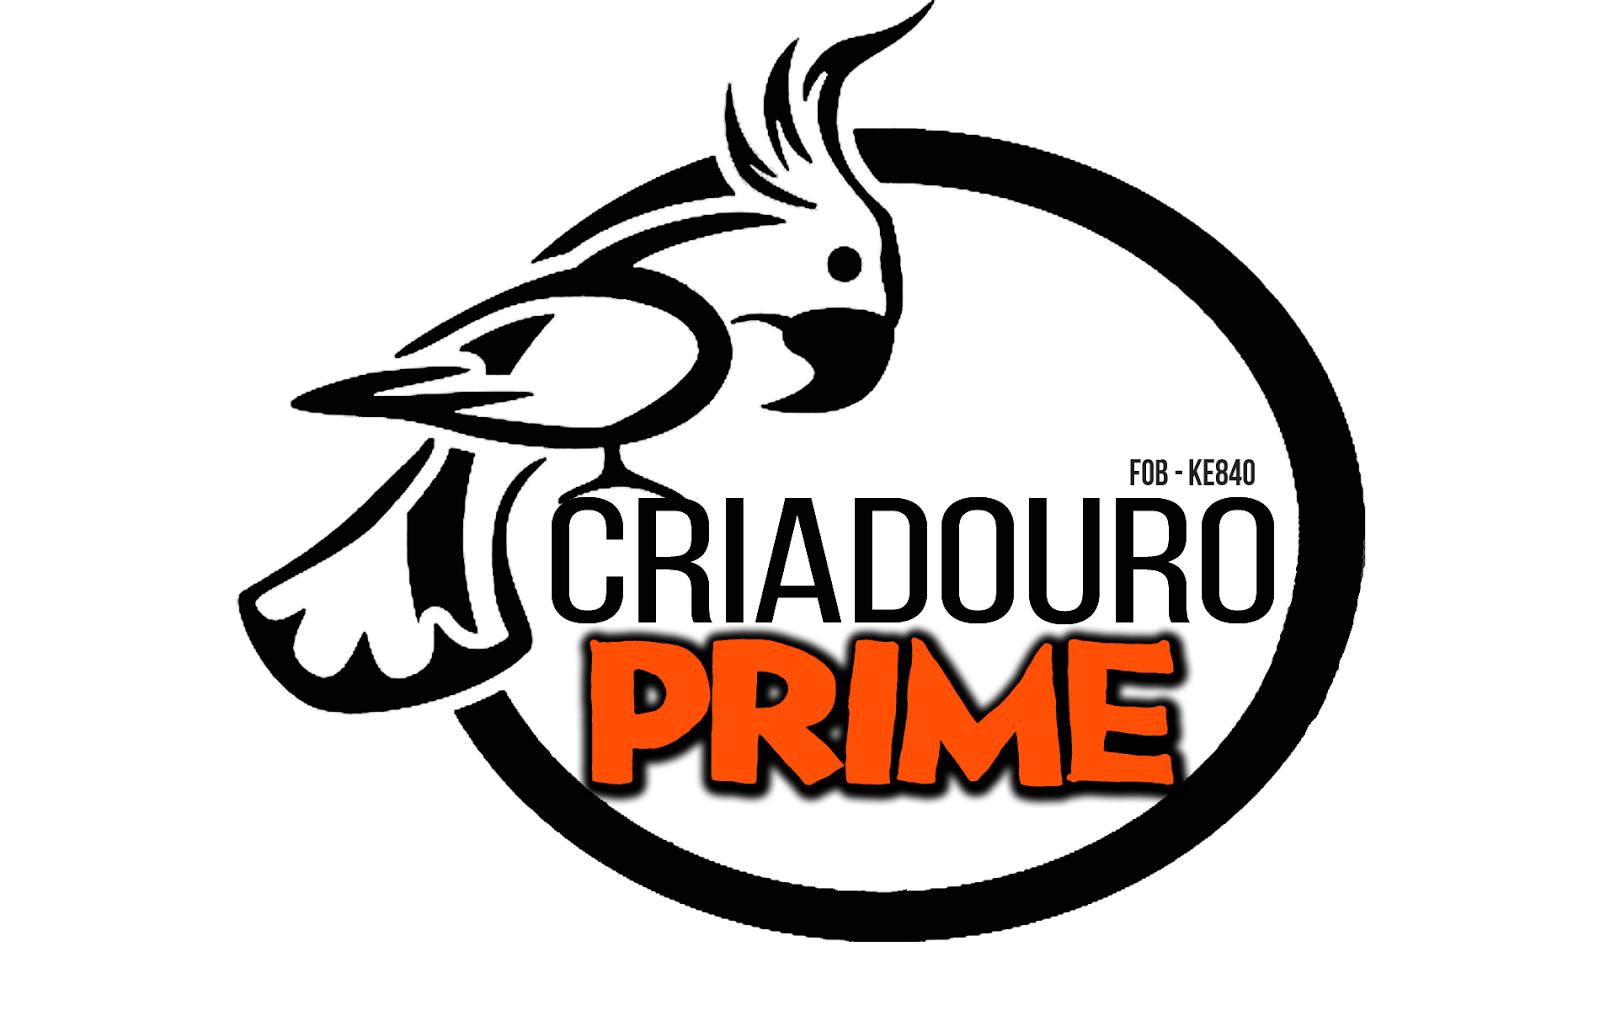 Criadouro Prime